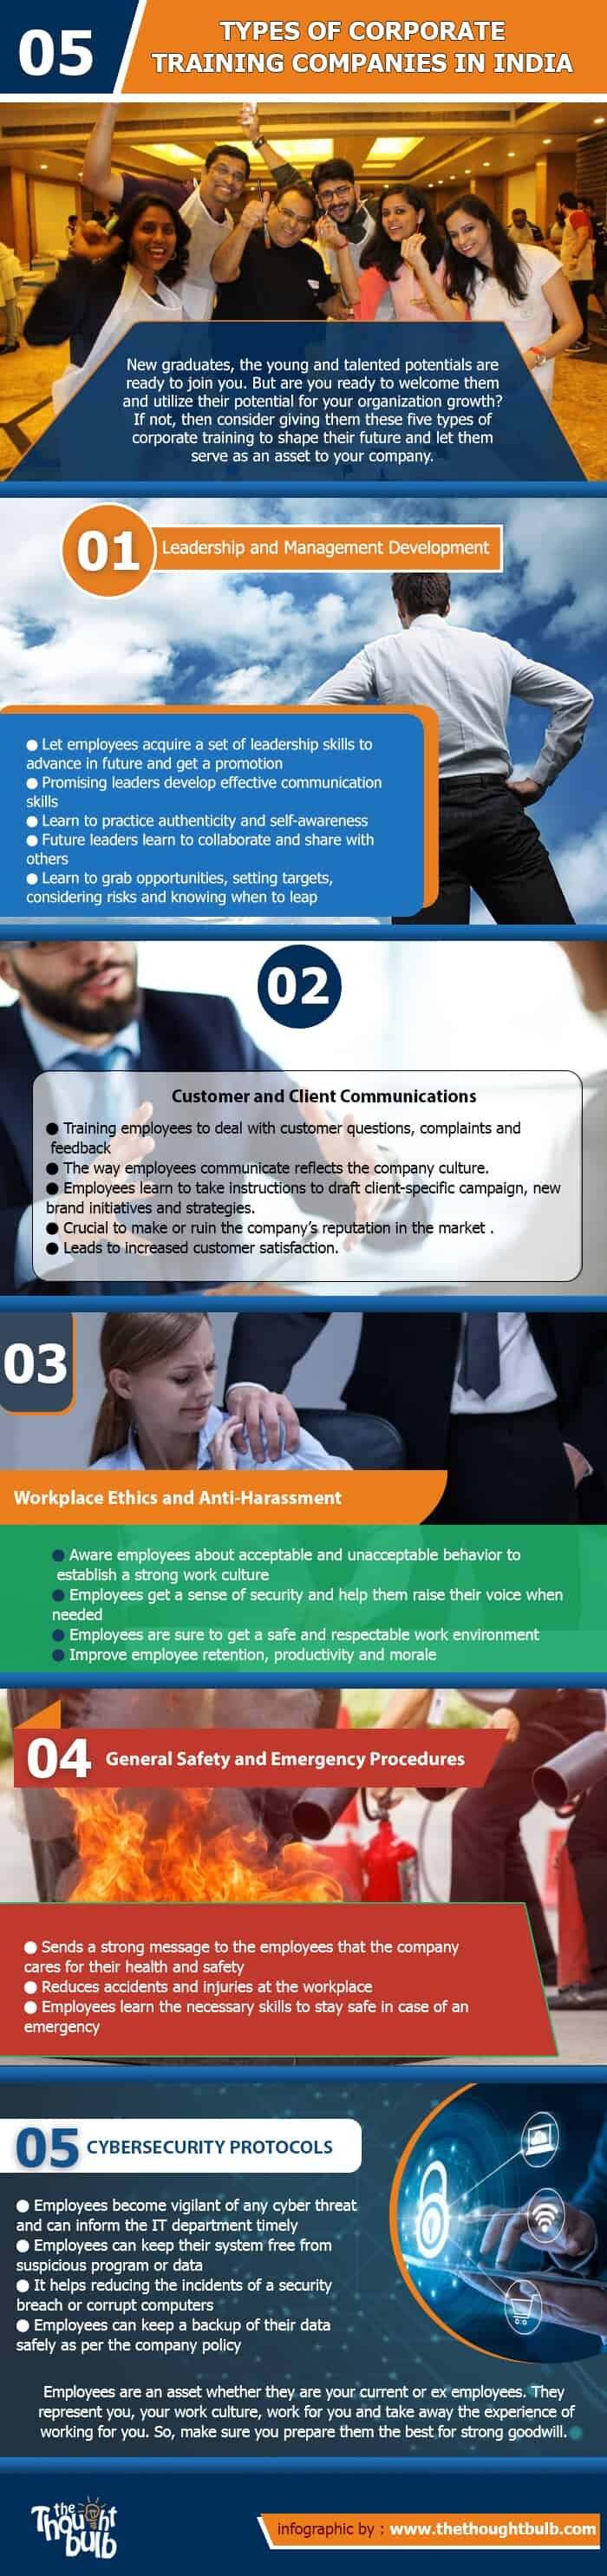 Types of Corporate Training Programs